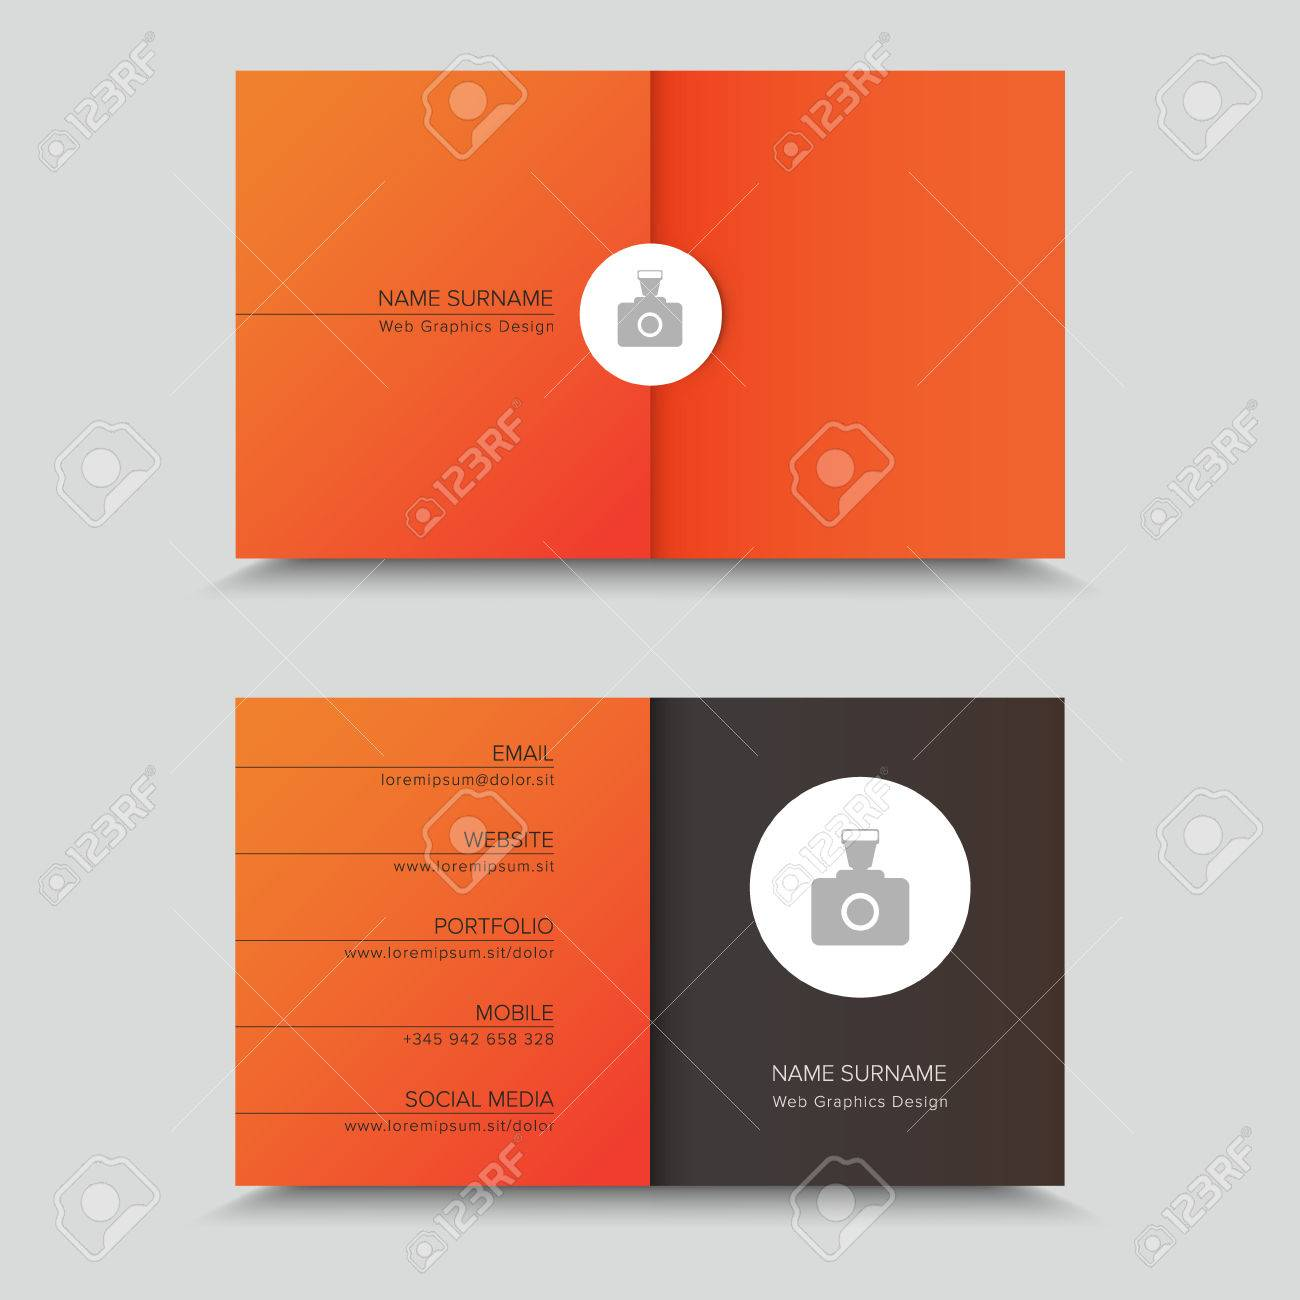 Business cards in sugar land choice image card design and card business cards in sugar land gallery card design and card template business card printing sugar land reheart Images